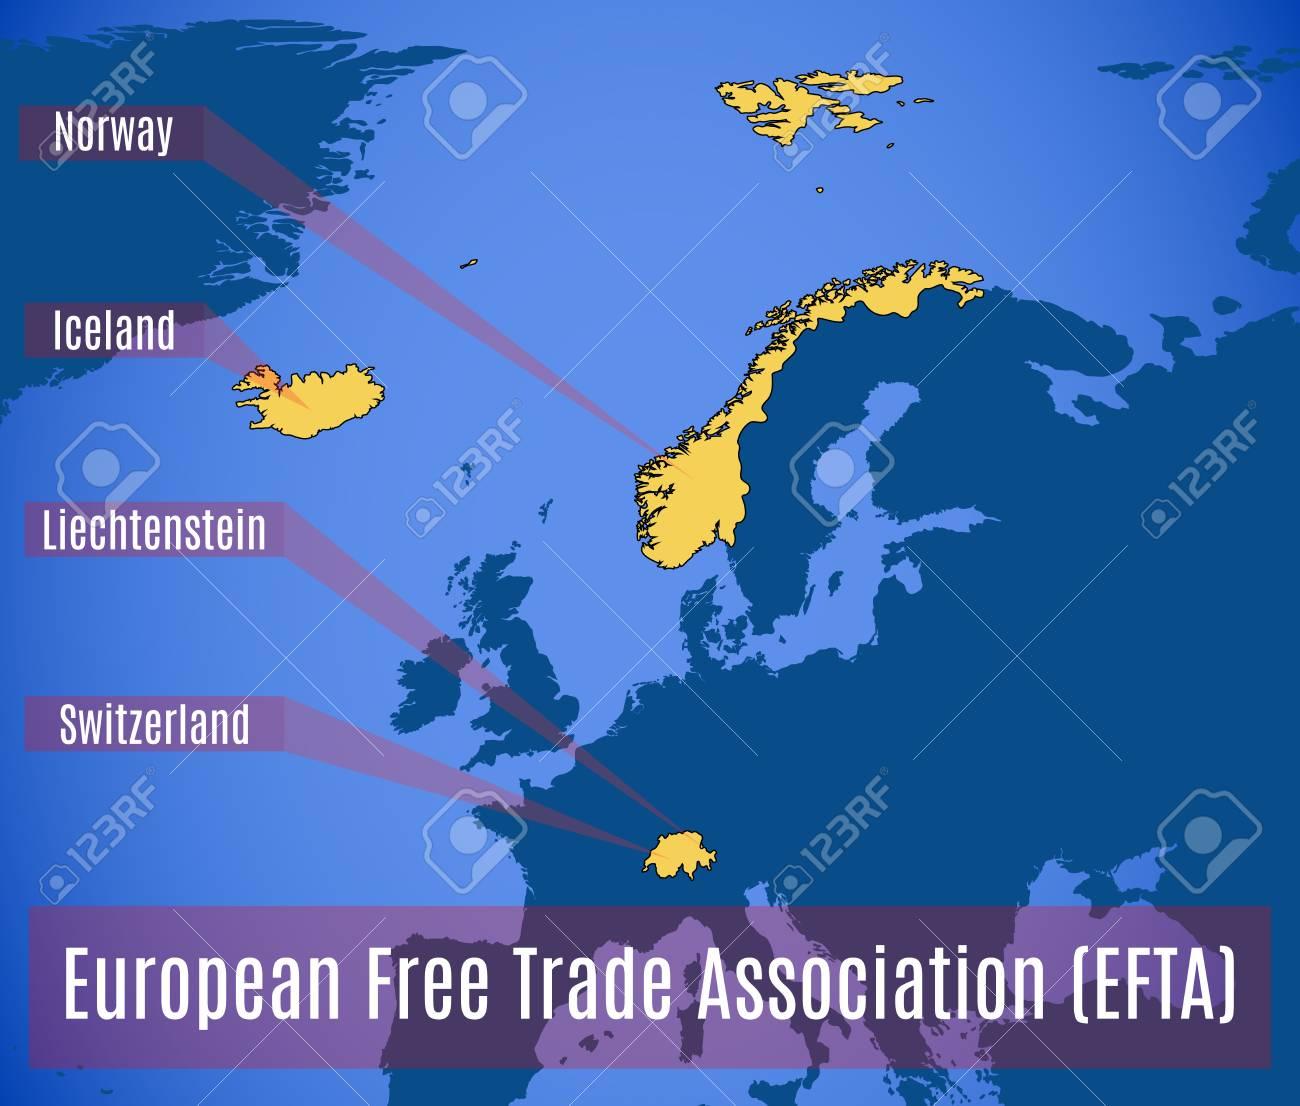 欧州自由貿易連合 (EFTA) の略地...